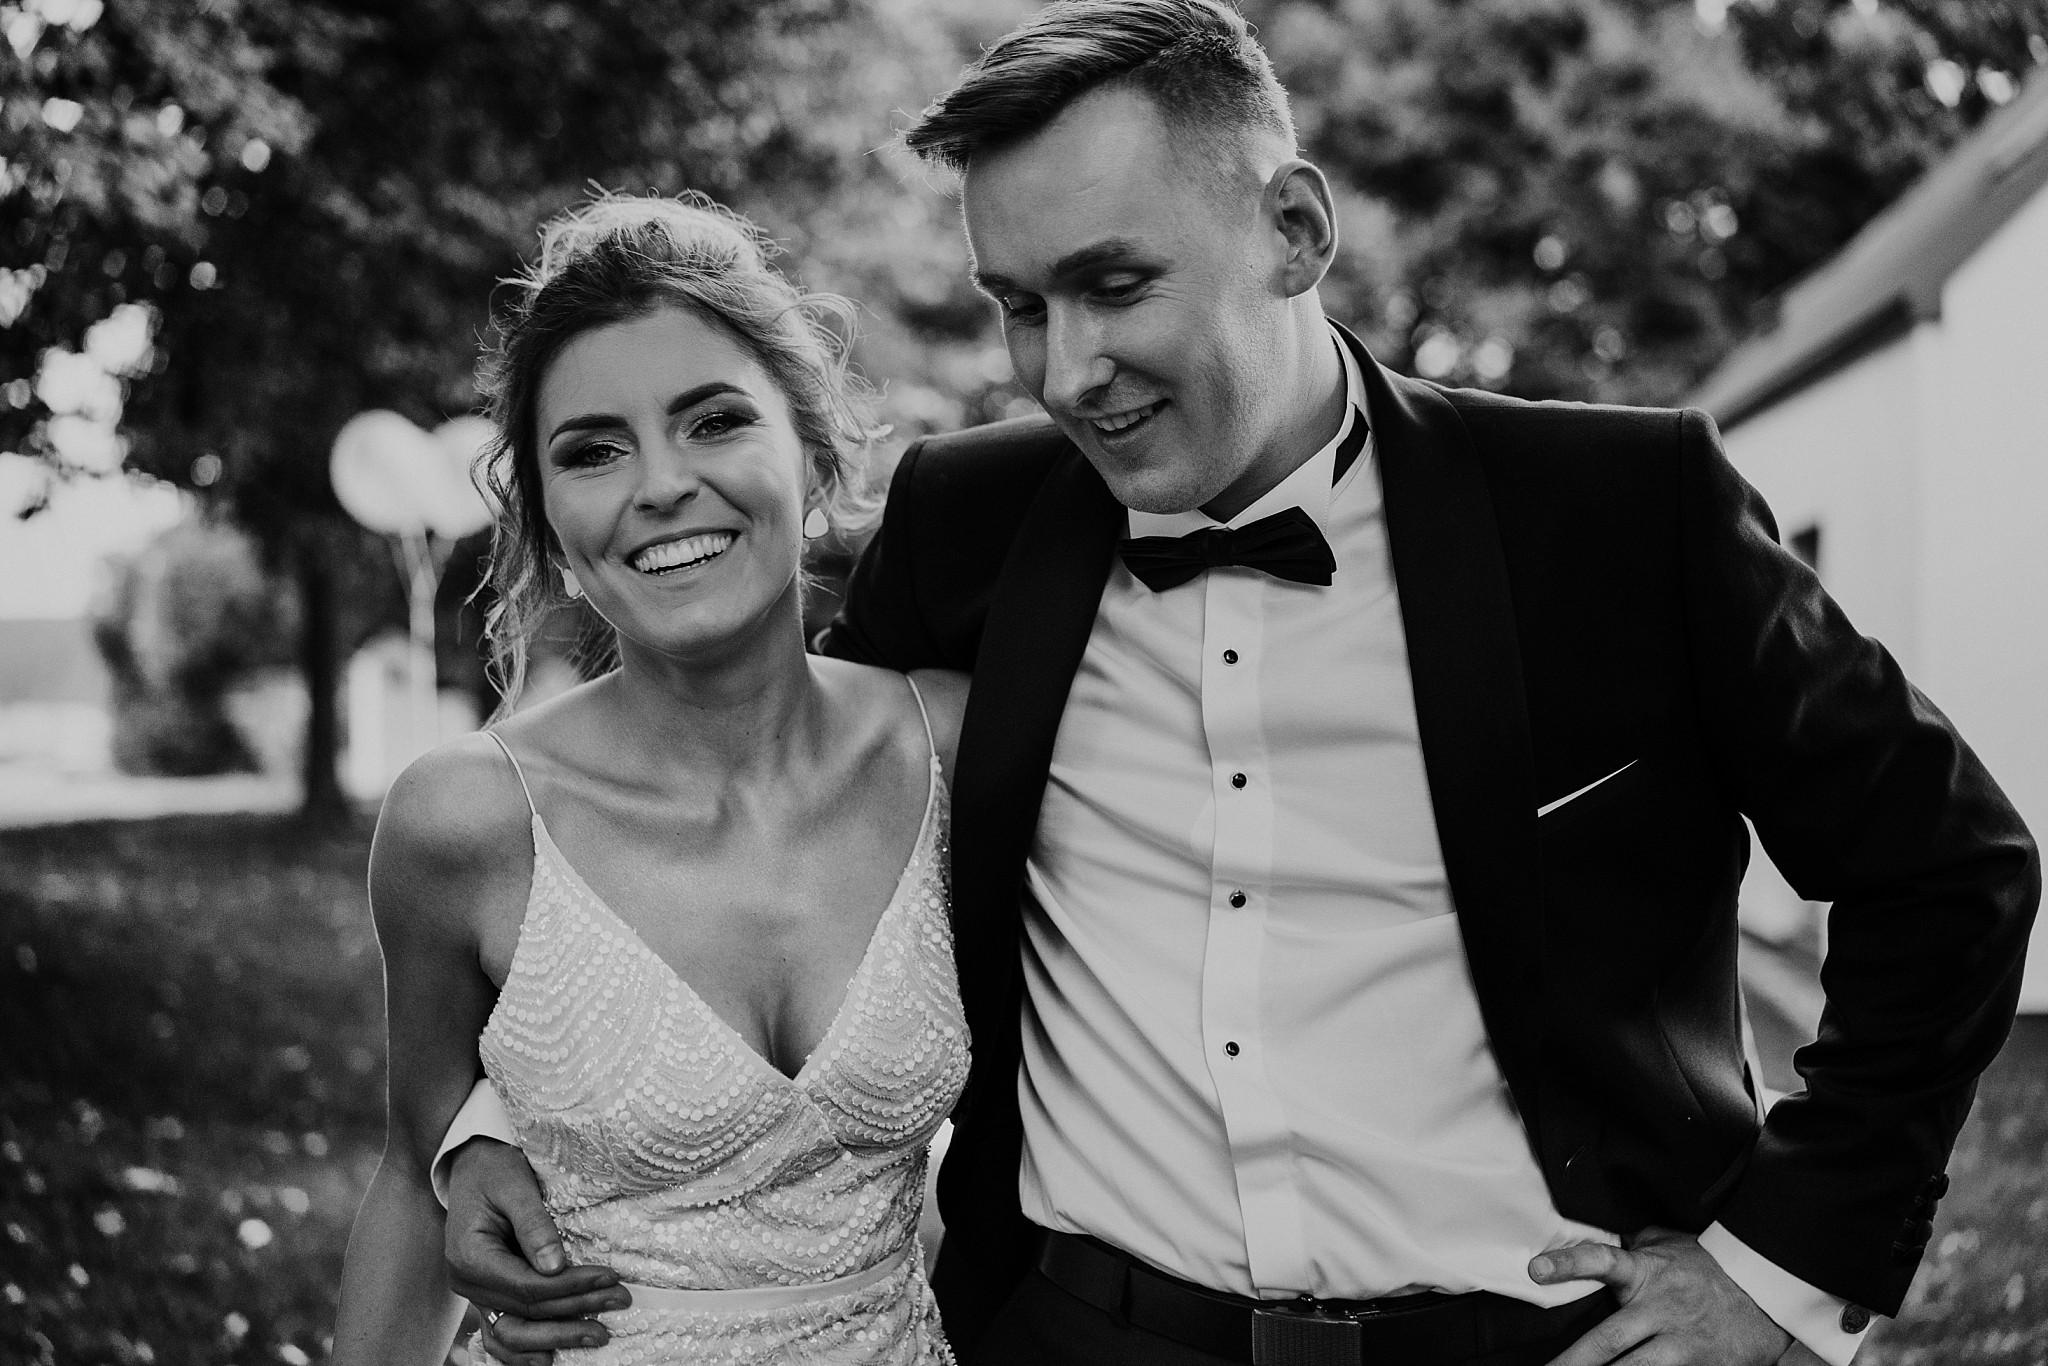 fotograf poznan wesele dobra truskawka piekne wesele pod poznaniem wesele w dobrej truskawce piekna para mloda slub marzen slub koronawirus slub listopad wesele koronawirus 357